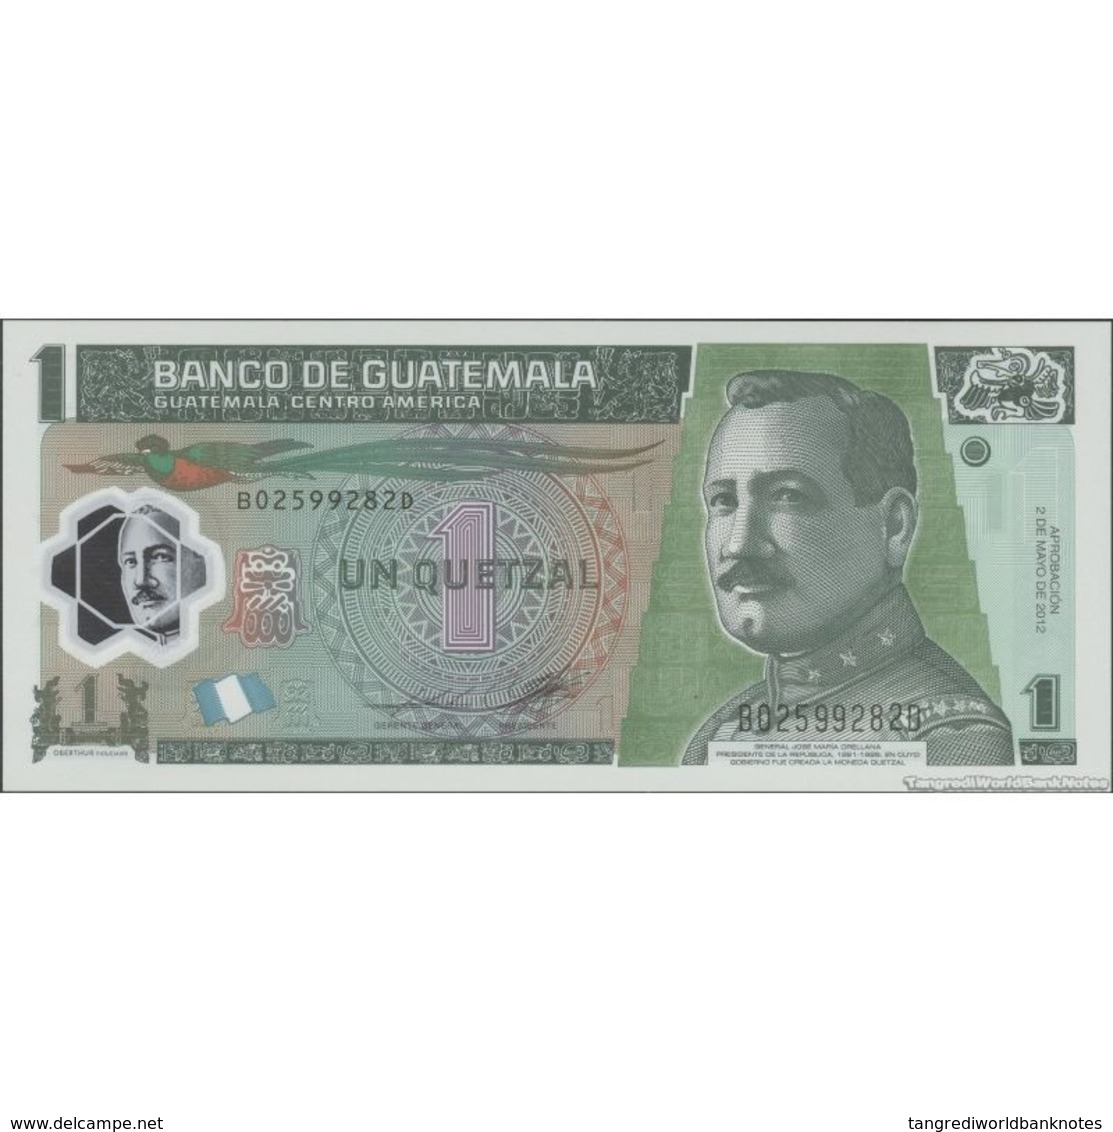 TWN - GUATEMALA 115c - 1 Quetzal 2.5.2012 Polymer - B XXXXXXX D - Printer: OBERTHUR FIDUCIARE UNC - Guatemala